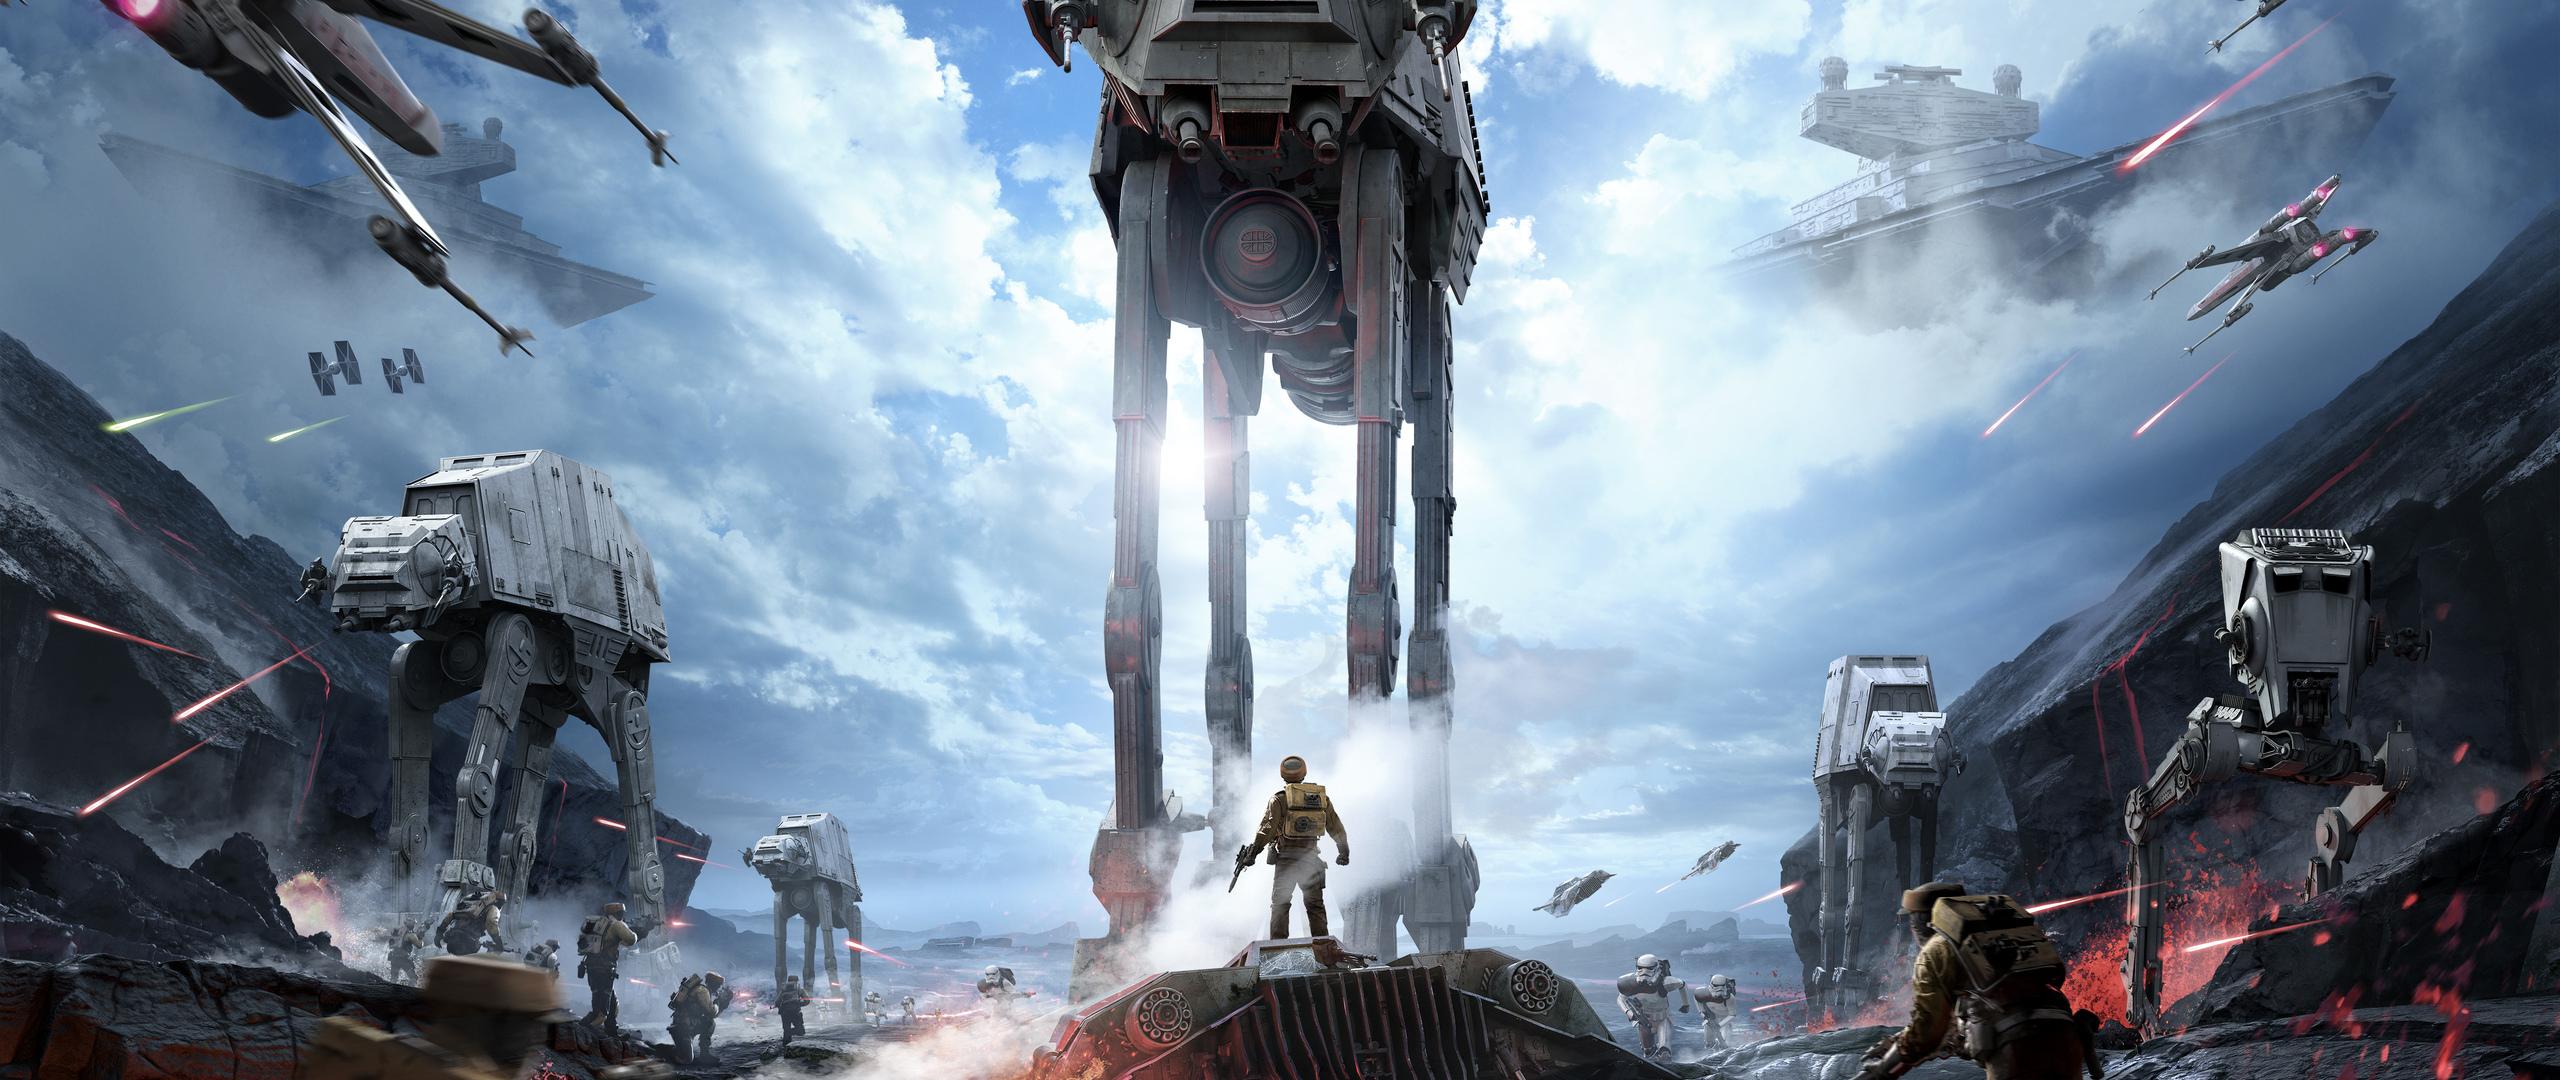 Star Wars: Episode VII The Force Awakens, Captain Phasma, Star Wars HD  Wallpaper. 2560x1080